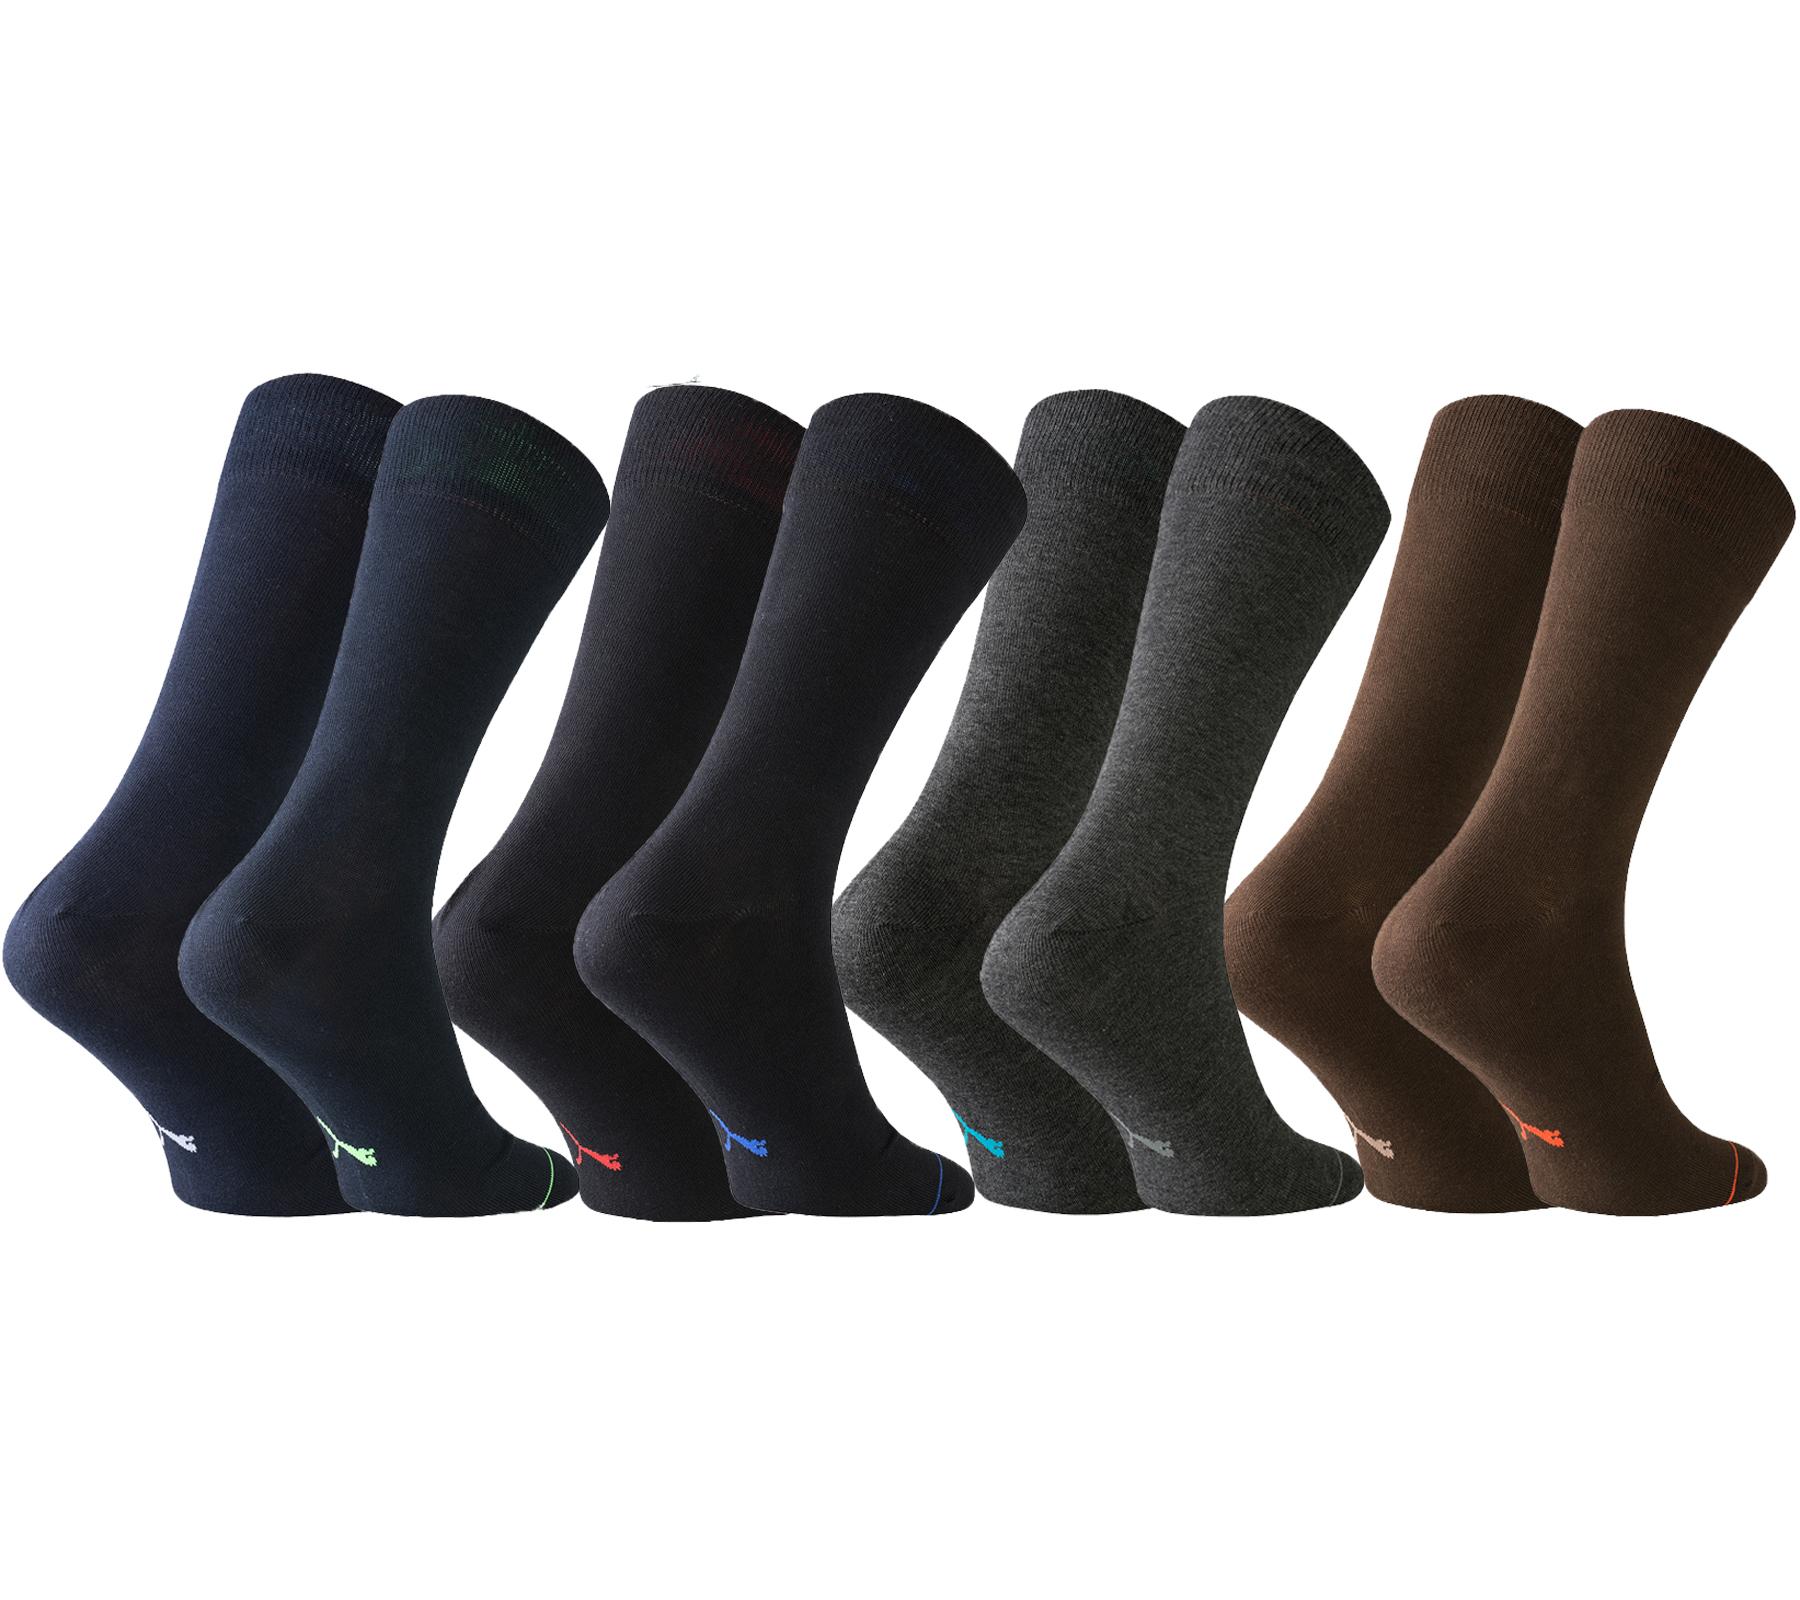 (Outlet46) Puma Fortune Socken 10er-Pack (Größe 47-49) für 9,99€